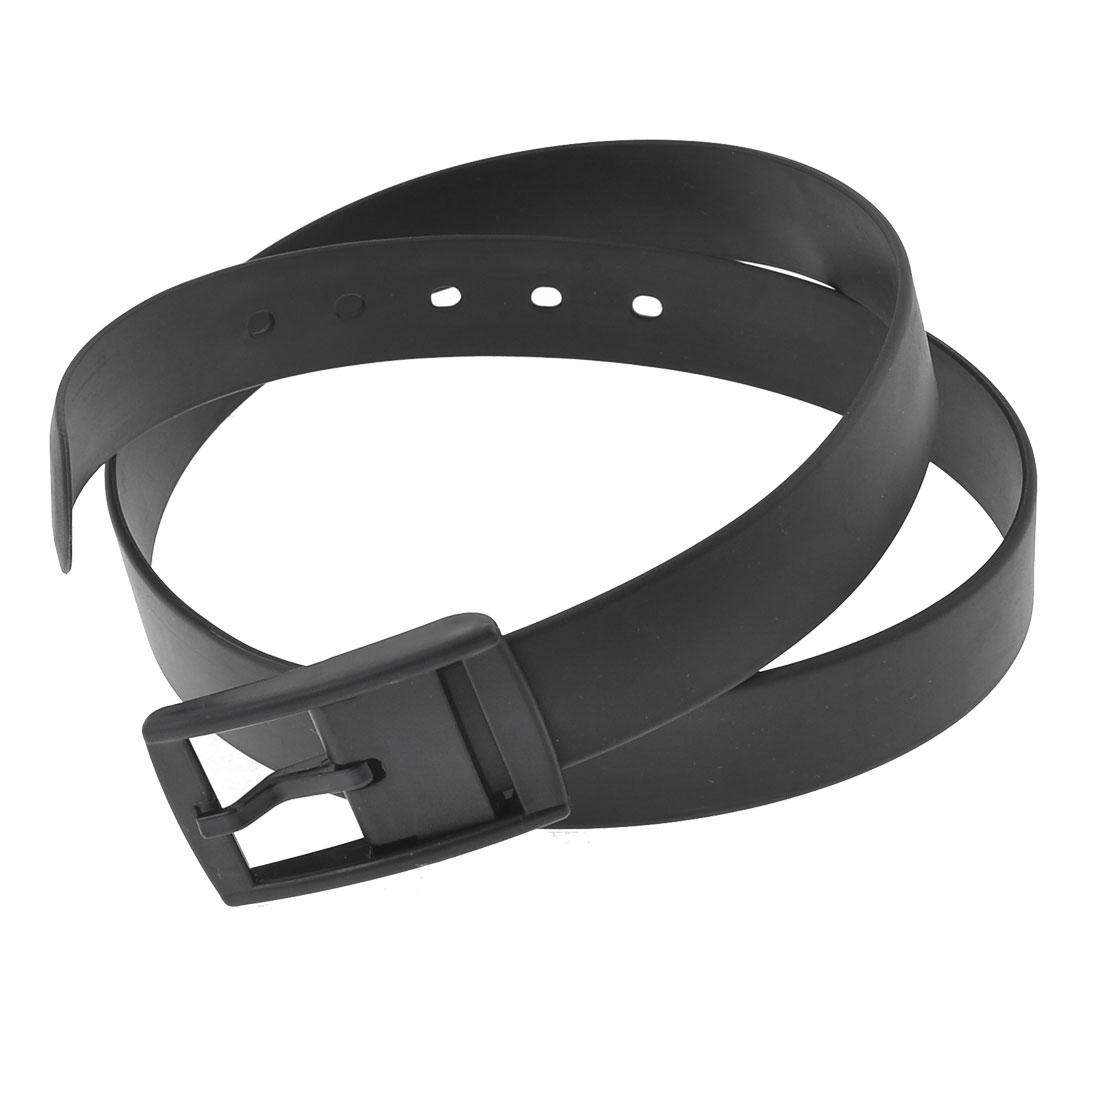 Ladies Black Single Prong Buckle Fragrant Band Allergy Free Waist Belt